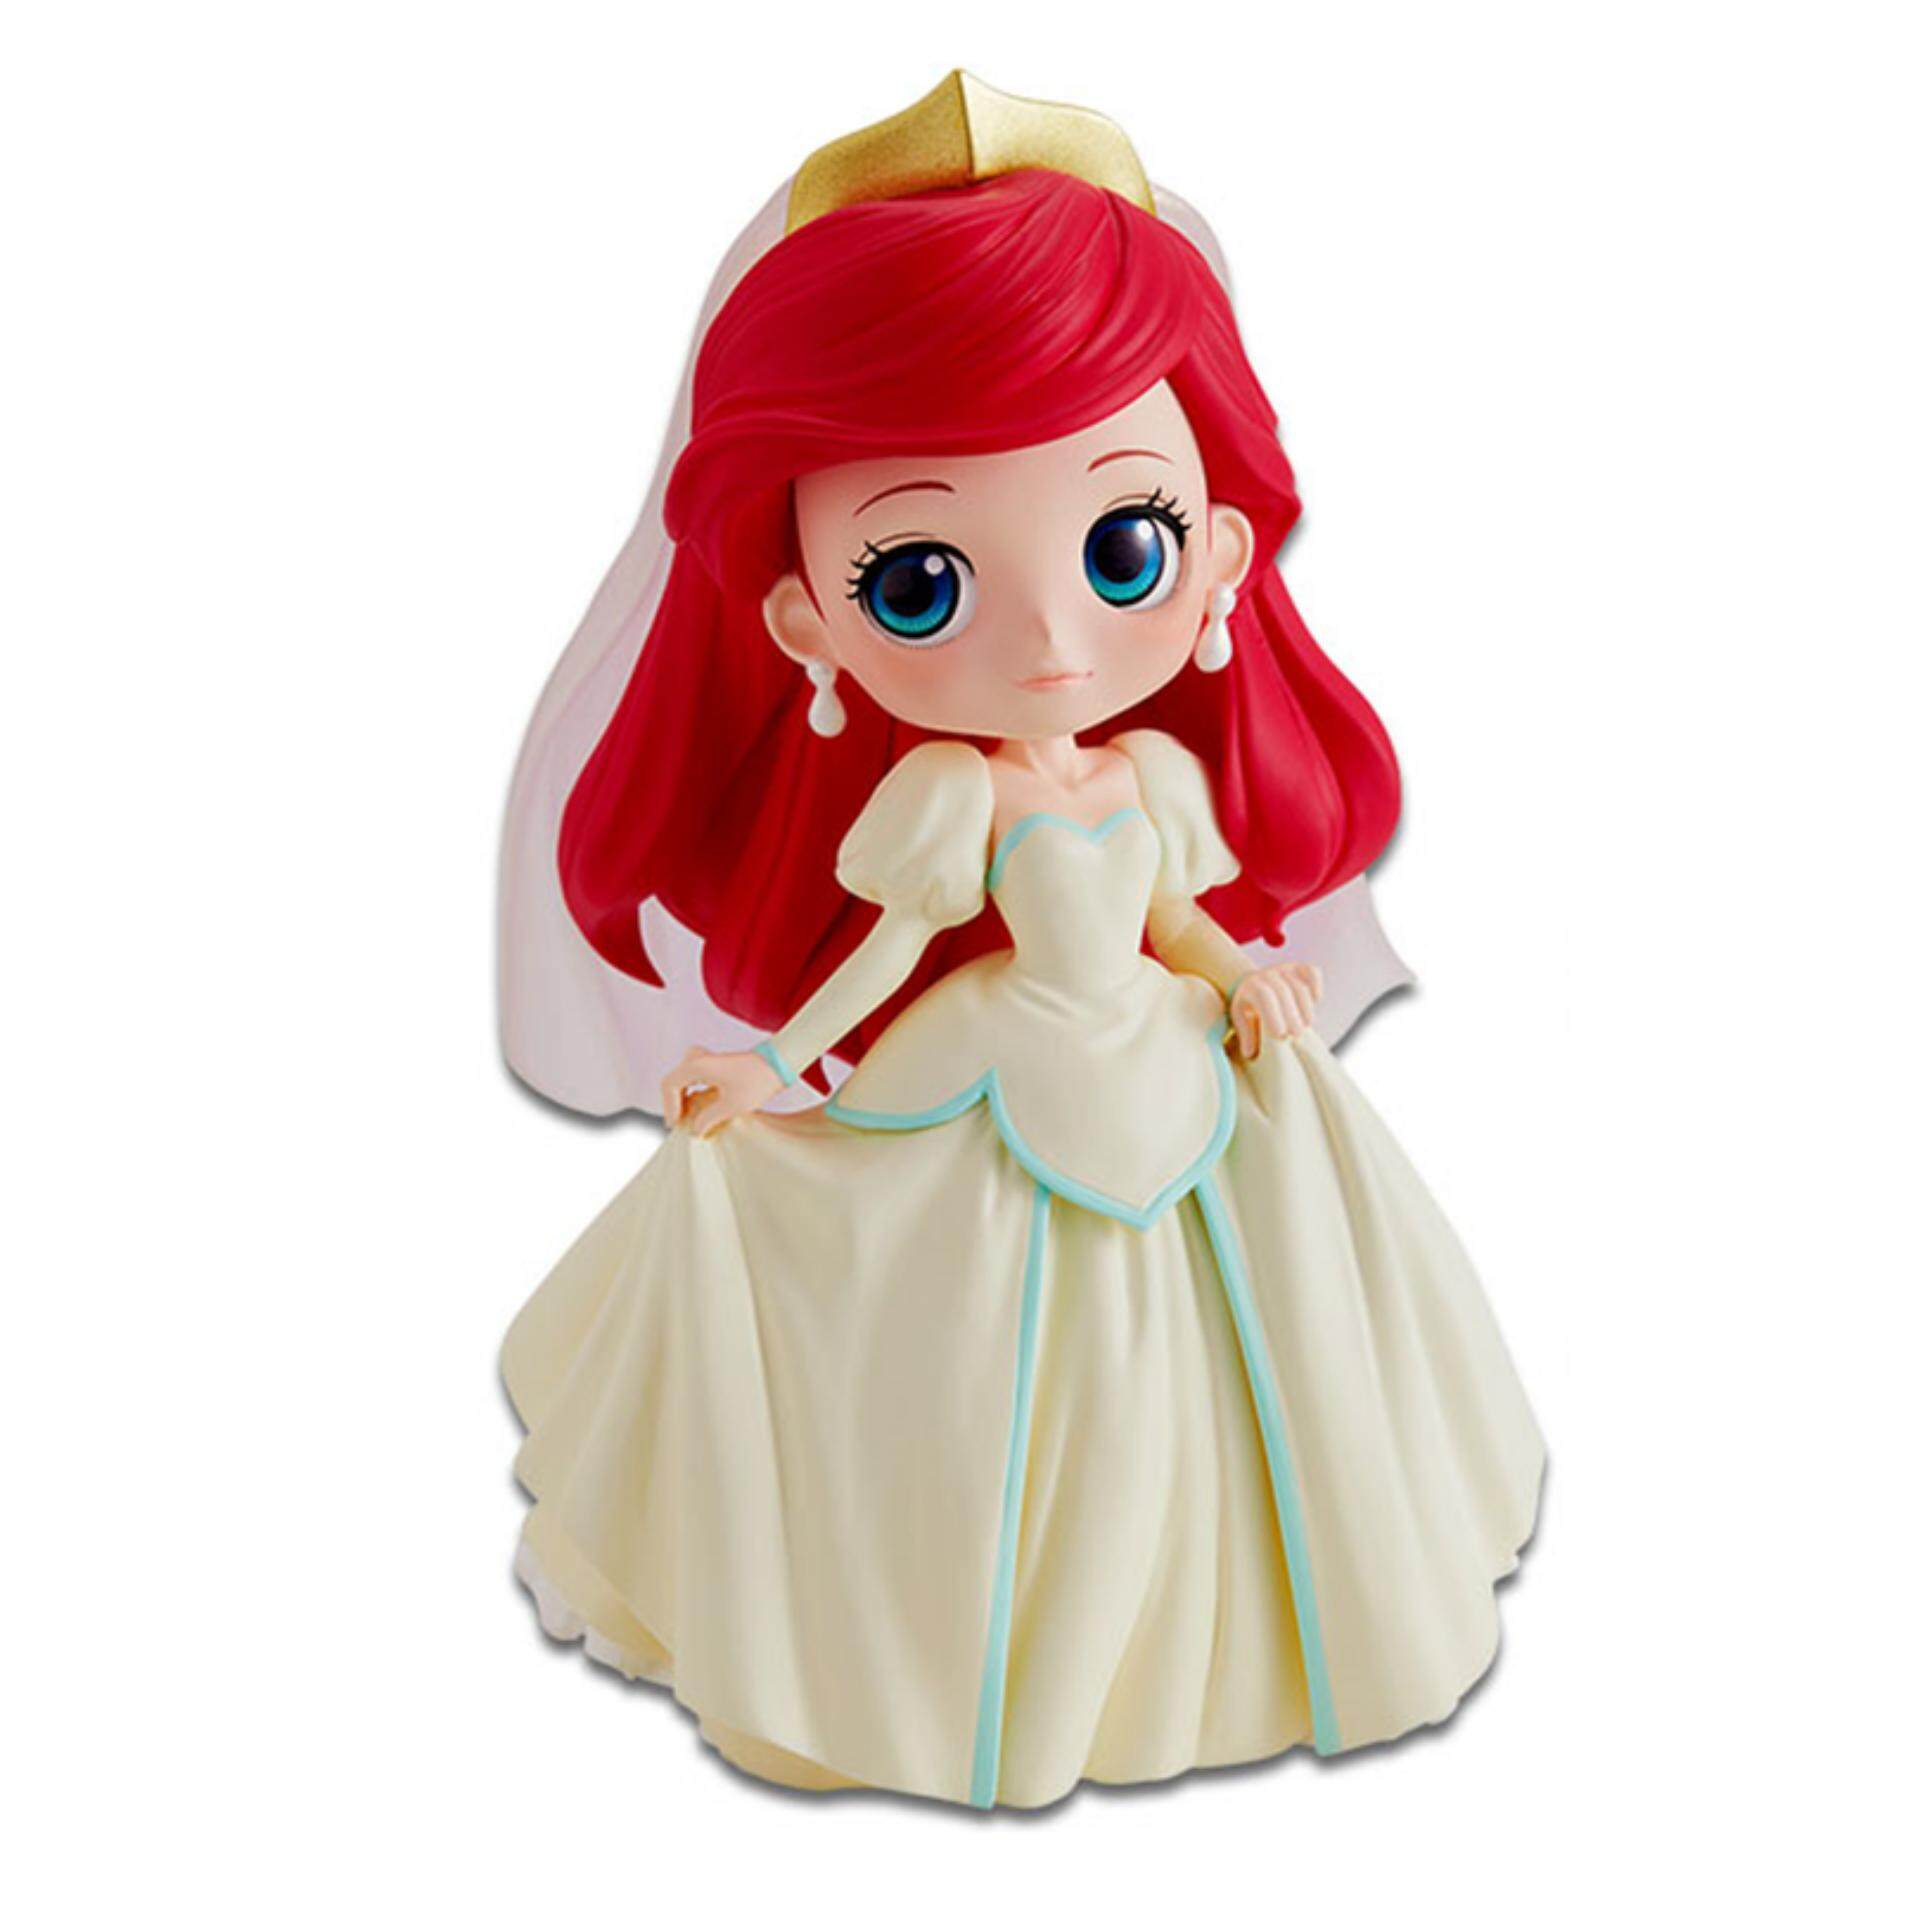 Banpresto Q Posket Disney Princess Figure Normal Version - Ariel Dreamy Style